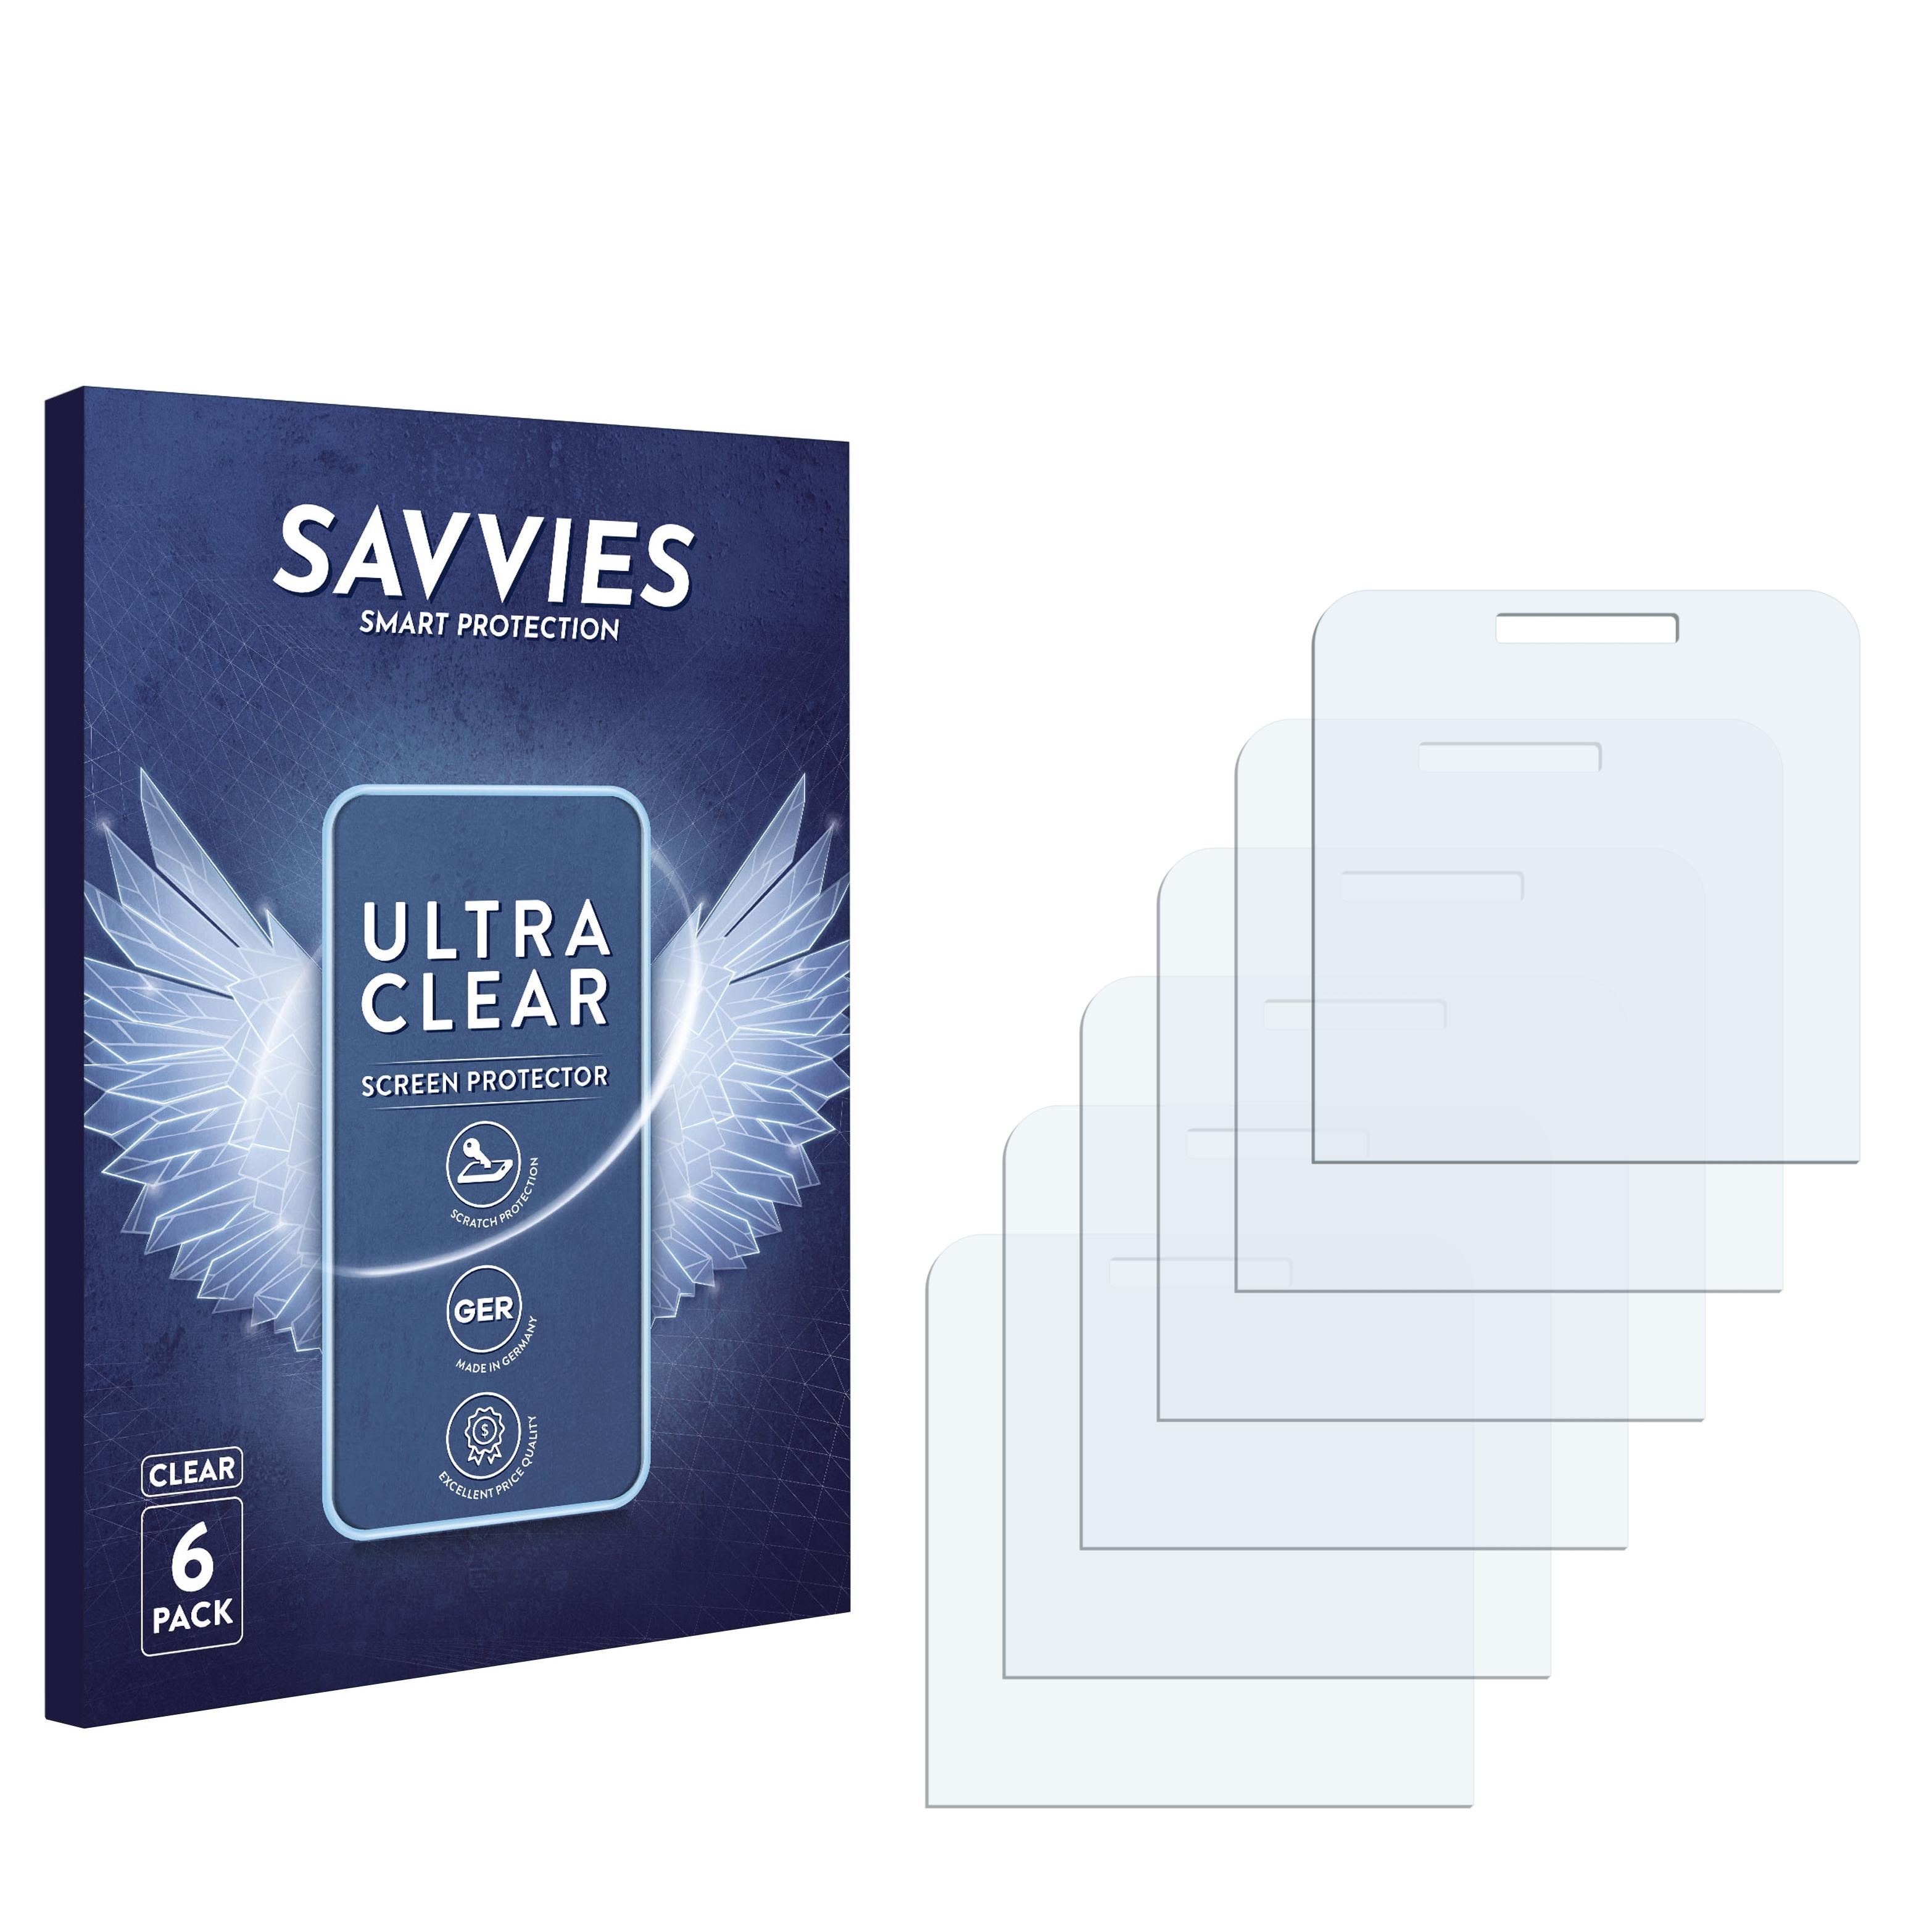 Ochranná fólie Savvies na 4G Systems Smart Messenger XSP1, 6ks